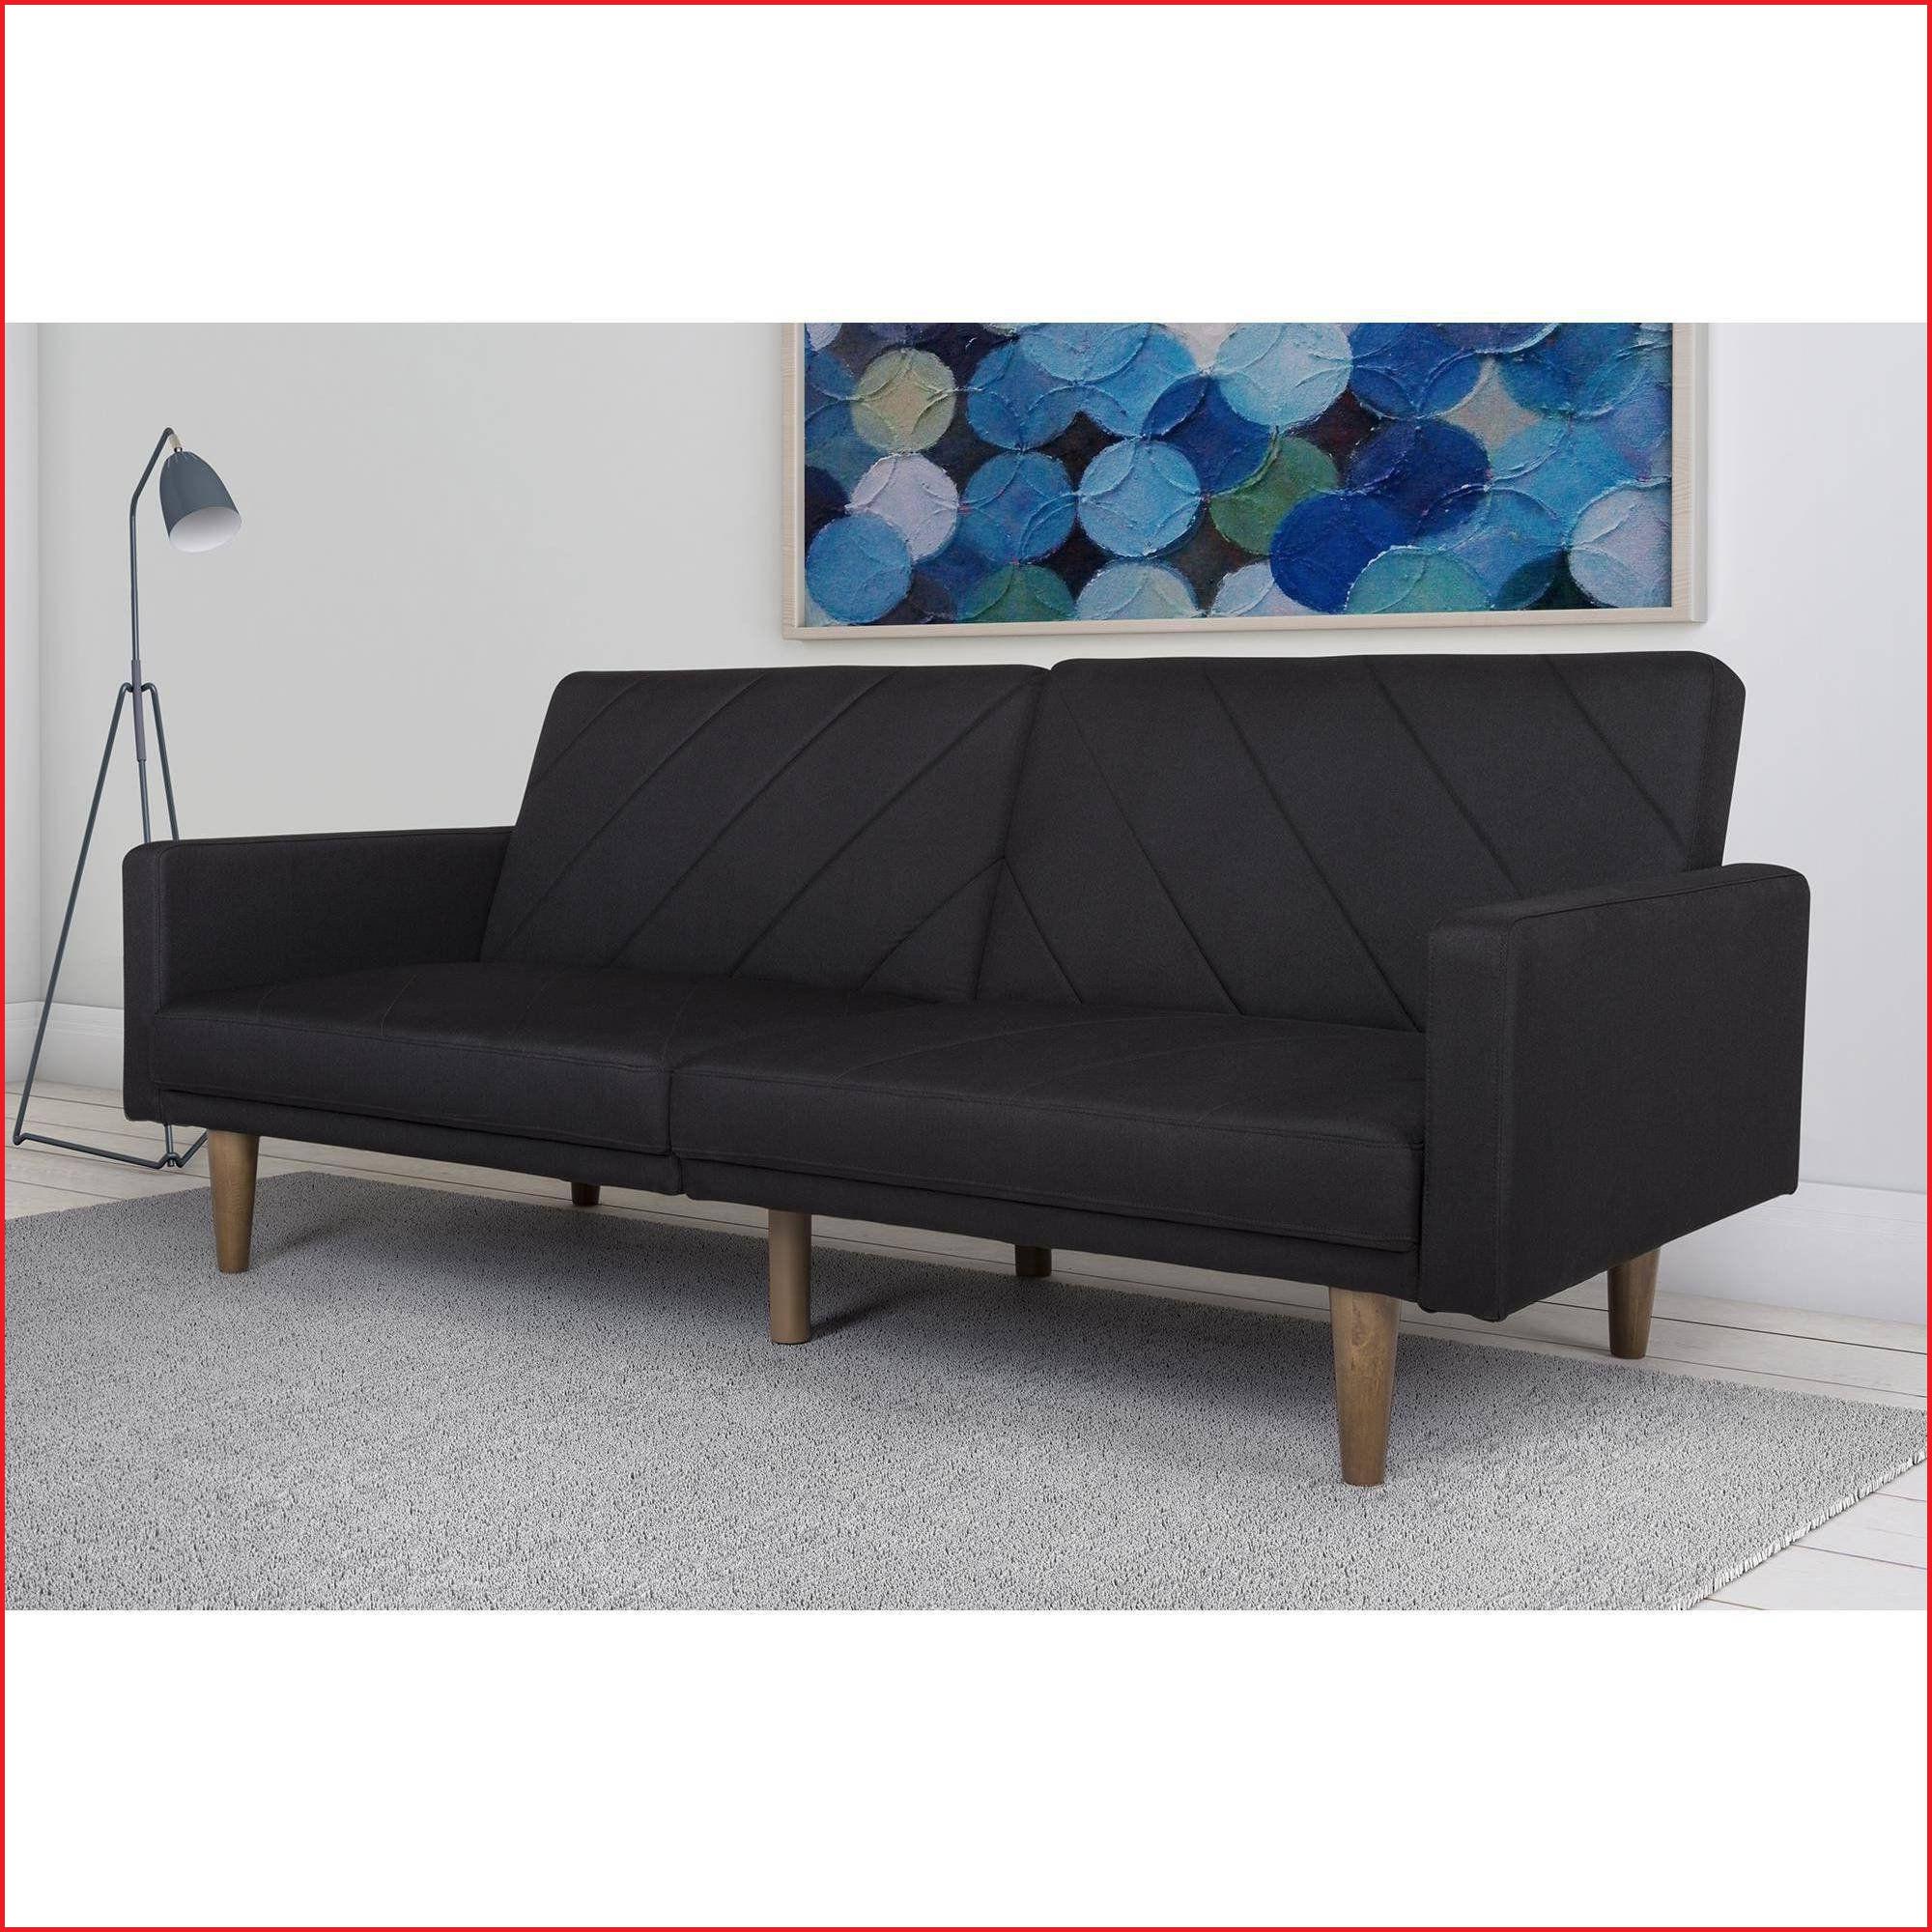 Merkamueble sofas 87dx sofa Cama Merkamueble sofas Cama Best Best sofa Cama Design